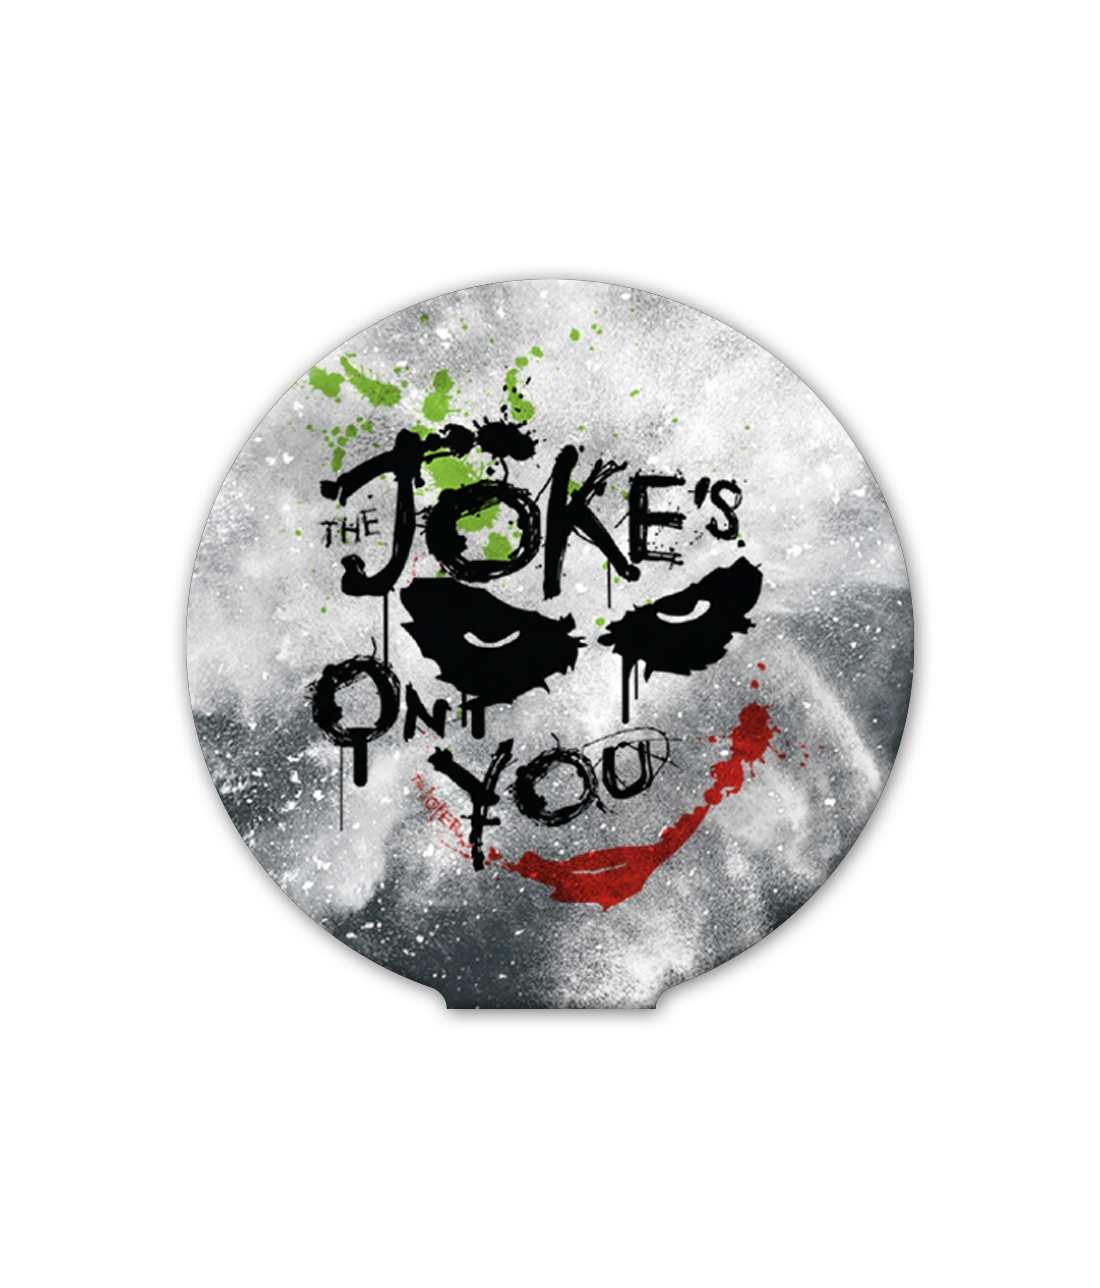 The Jokes on you - Macmerise Sticky Pad